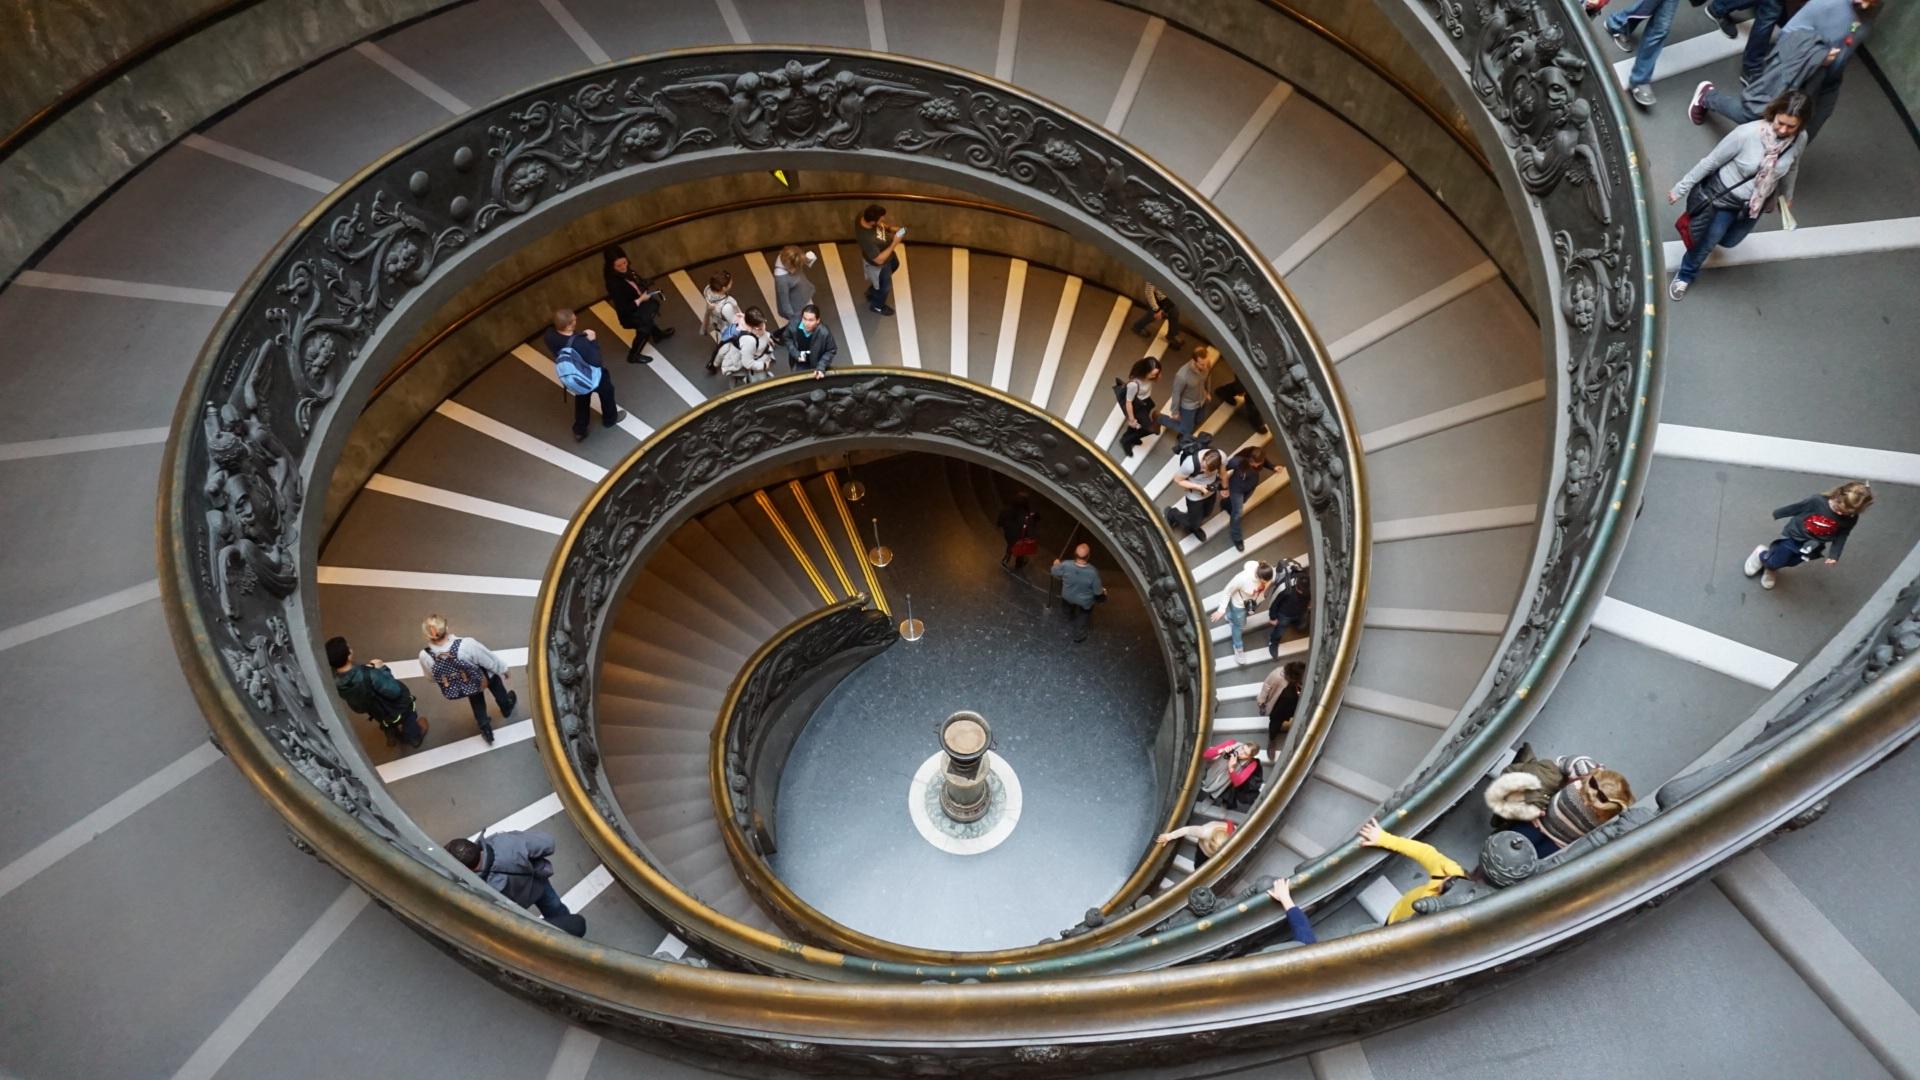 Sixtus Chapel, Vatican, Rome, Italy